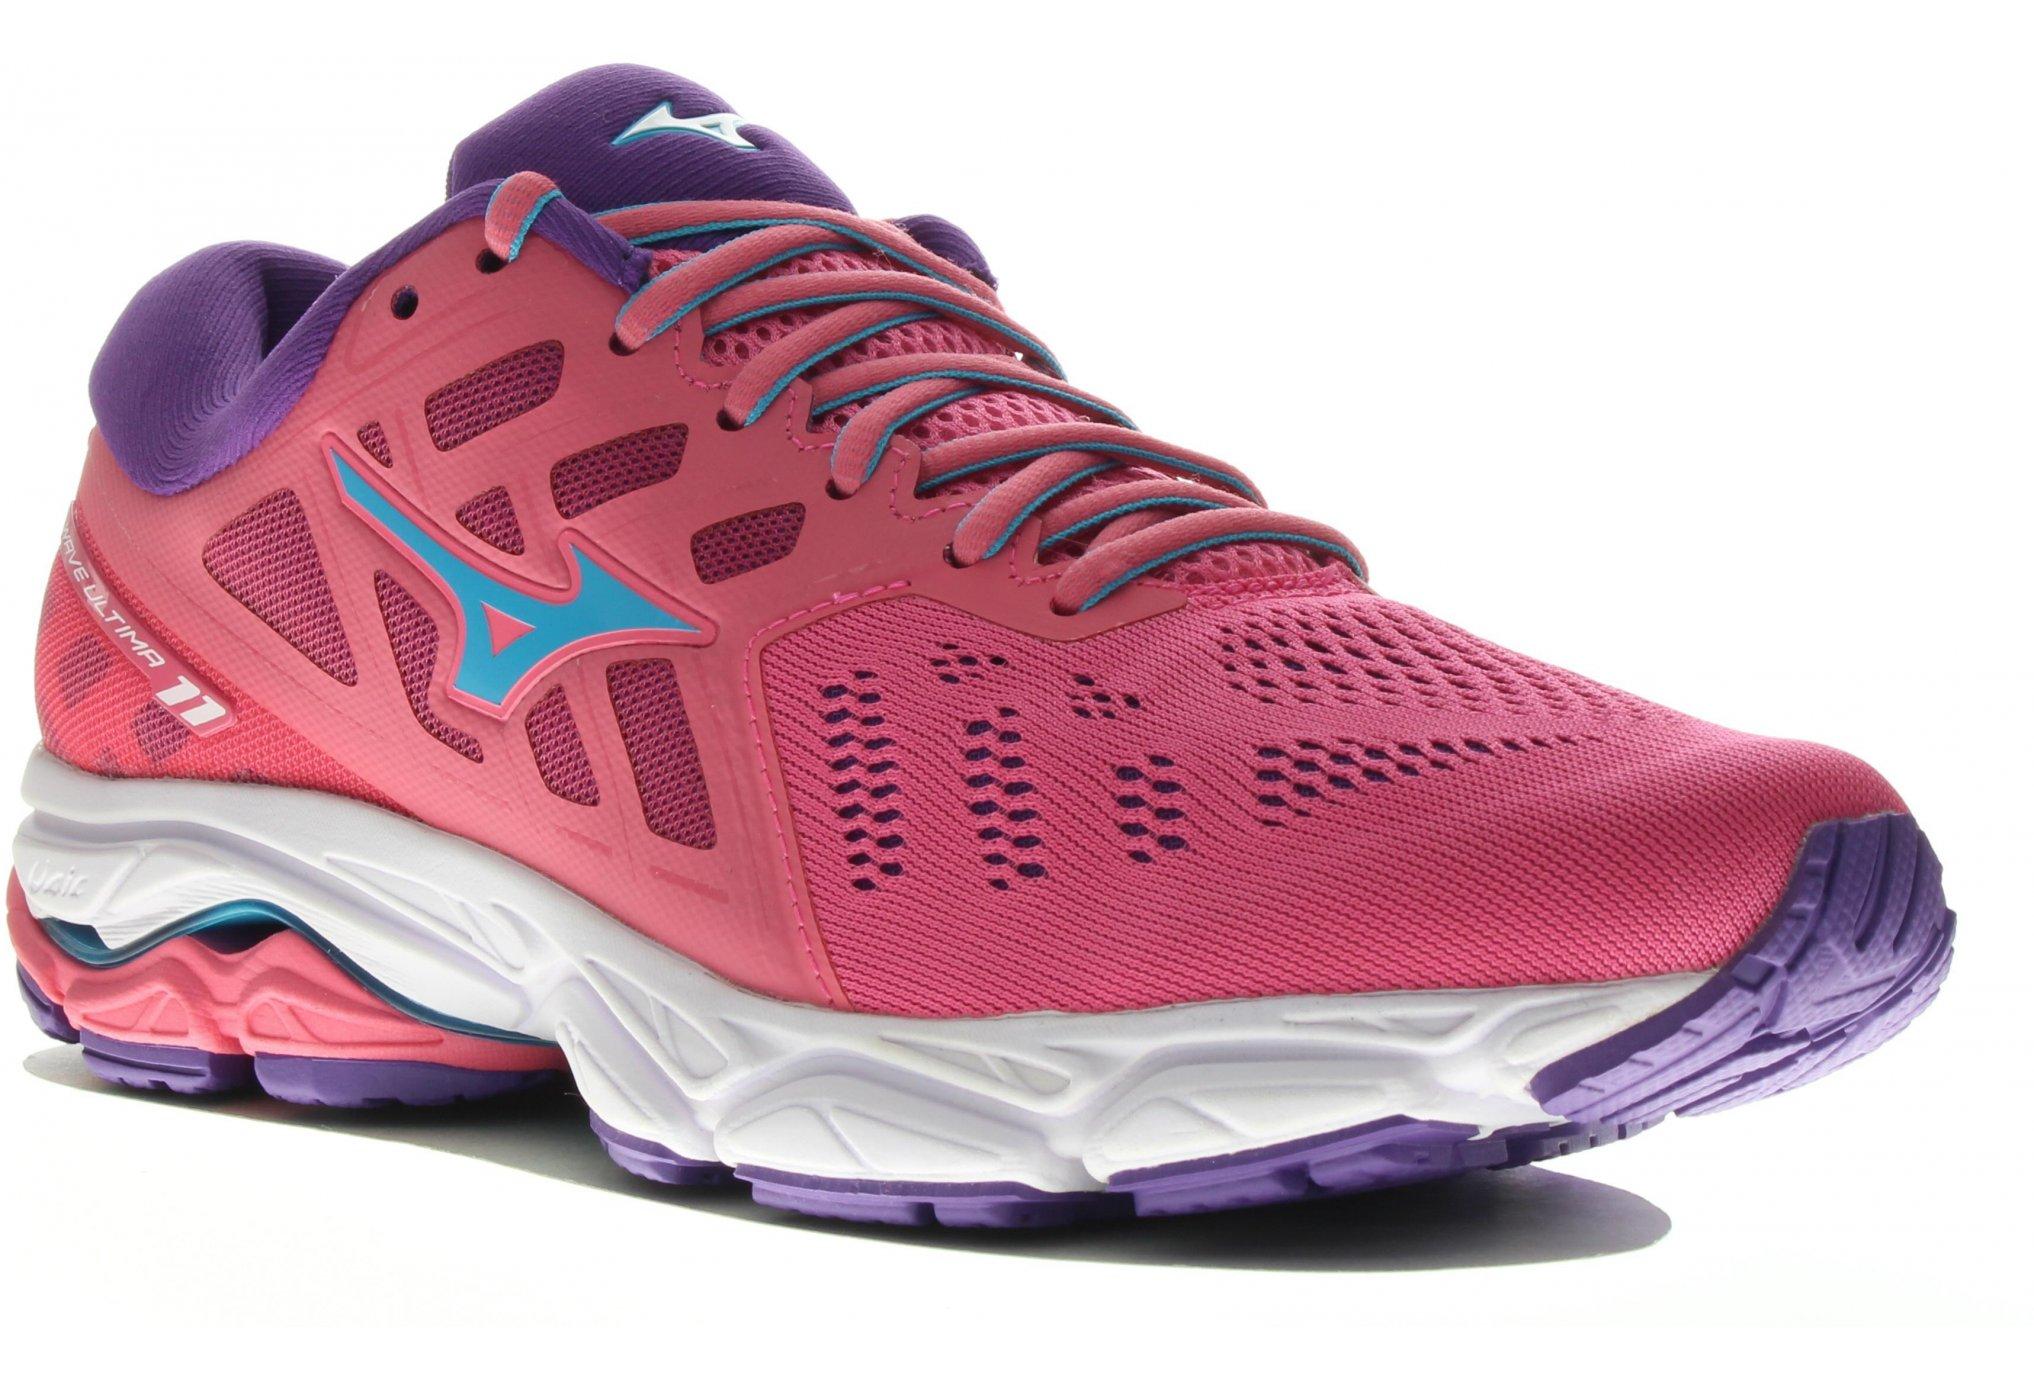 Mizuno Wave Ultima 11 Chaussures running femme